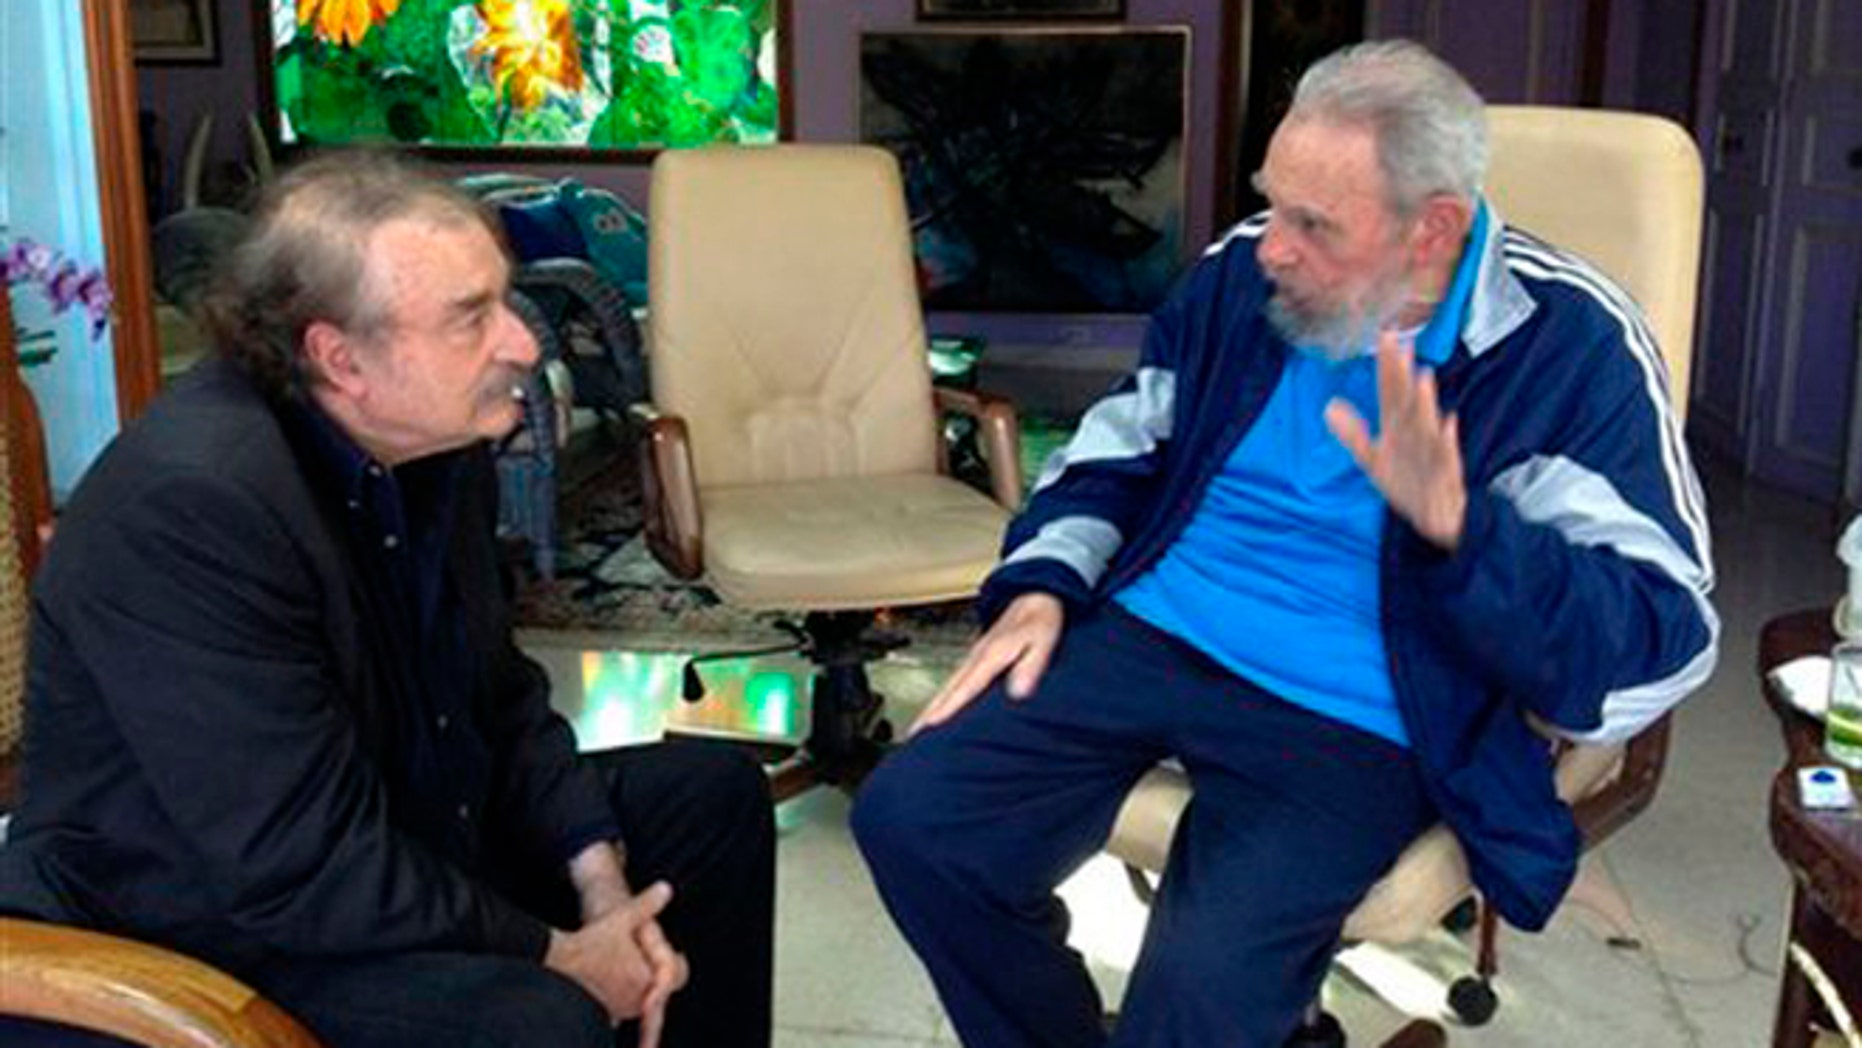 Fidel Castro and Spanish journalist Ignacio Ramonet on Dec. 13, 2013, in Havana, Cuba.